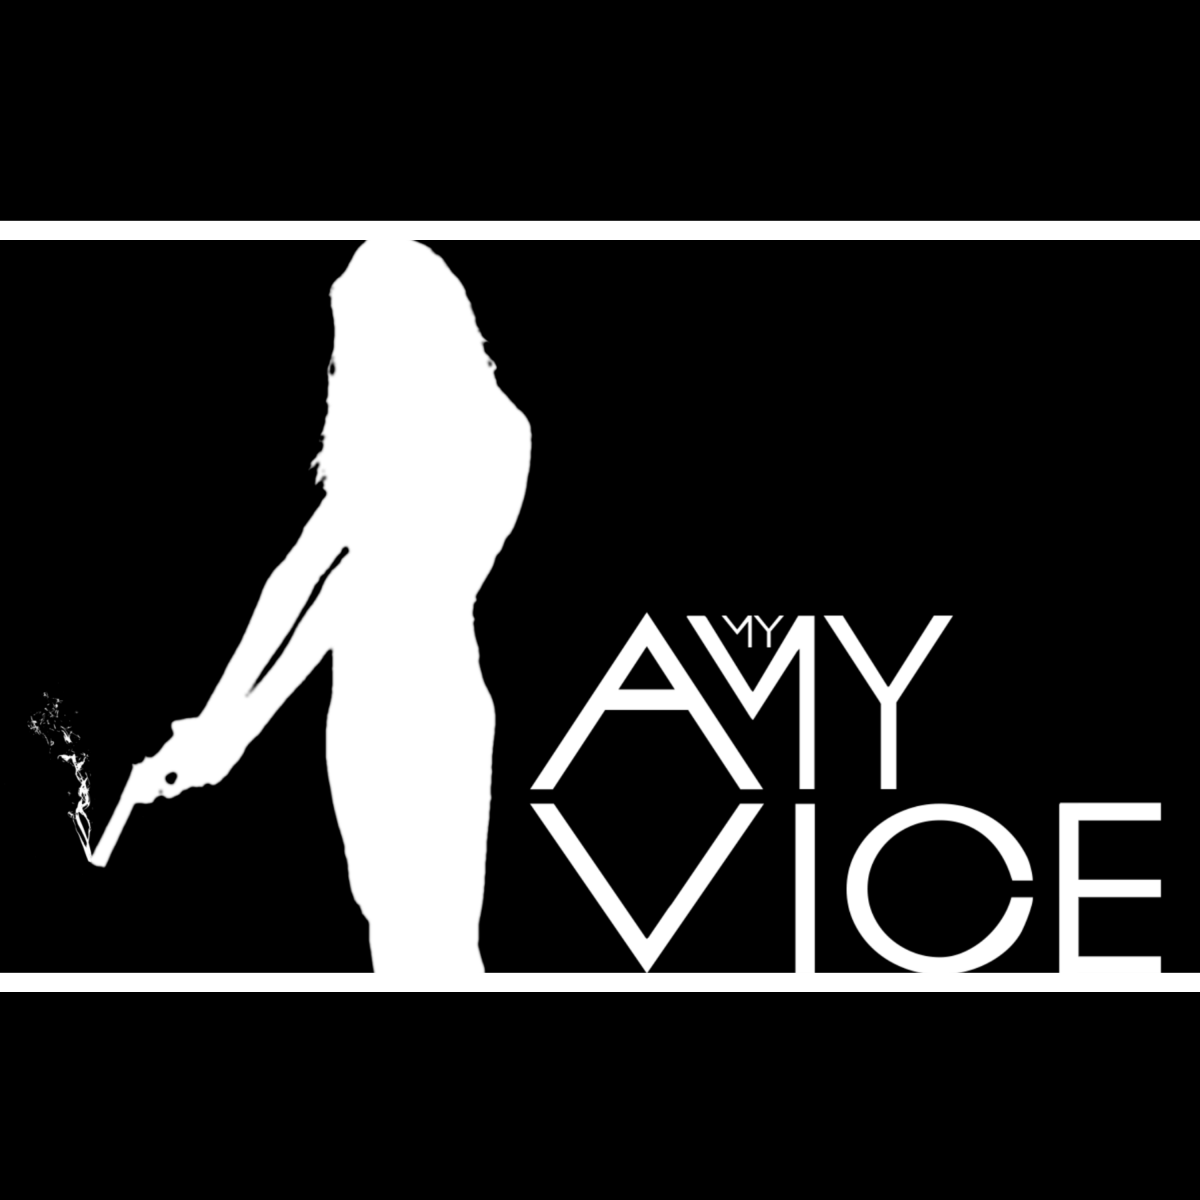 My Amy Vice